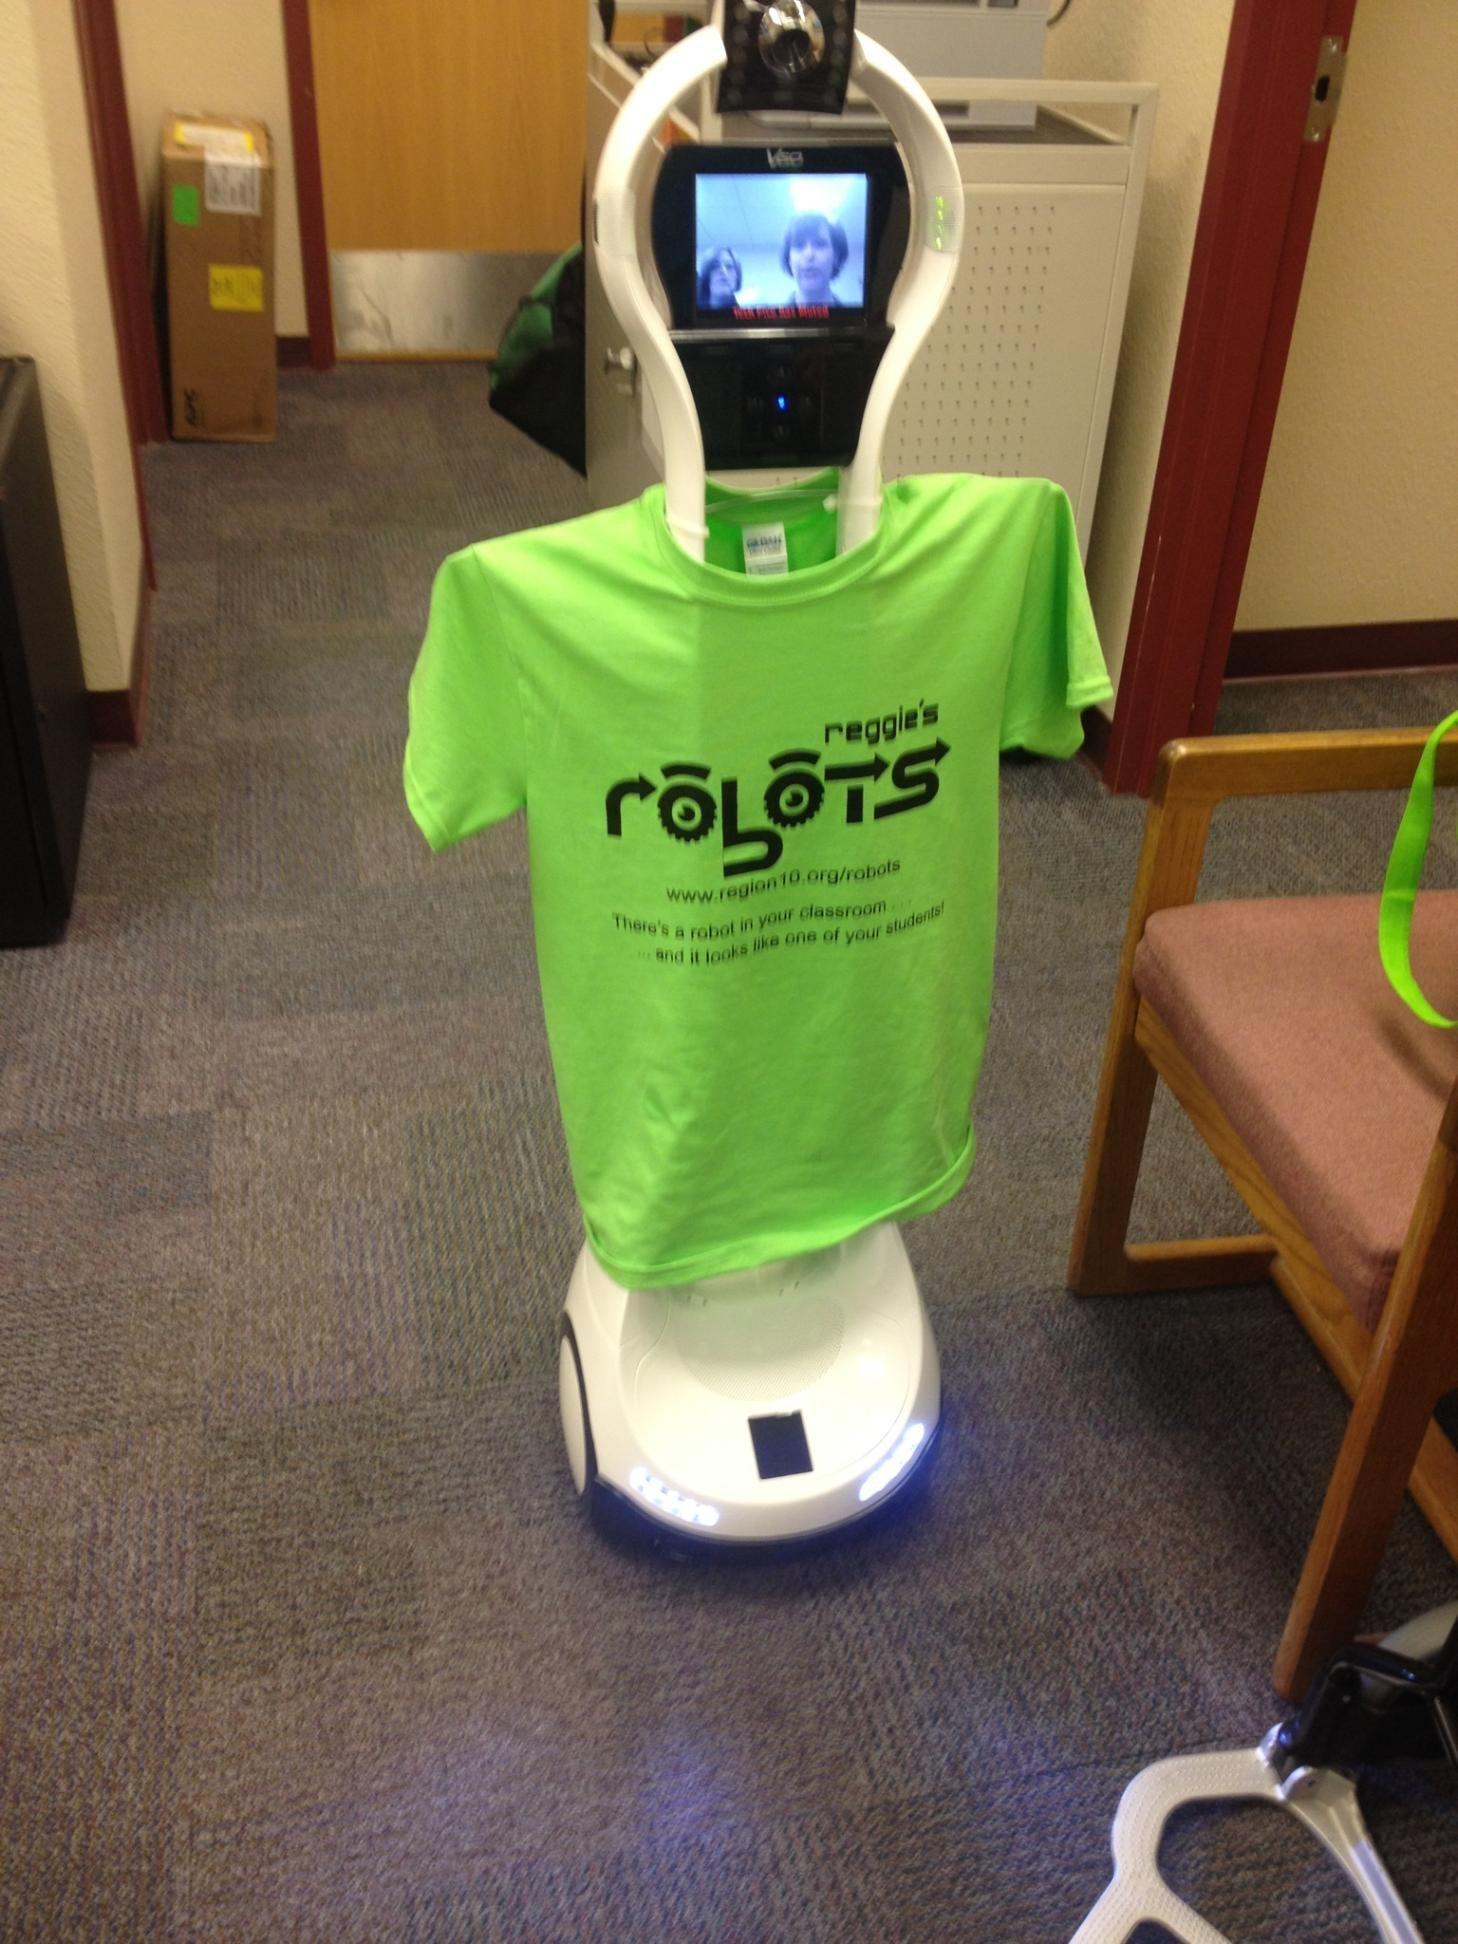 FirstClass Technology The VGo Robot helps patients at